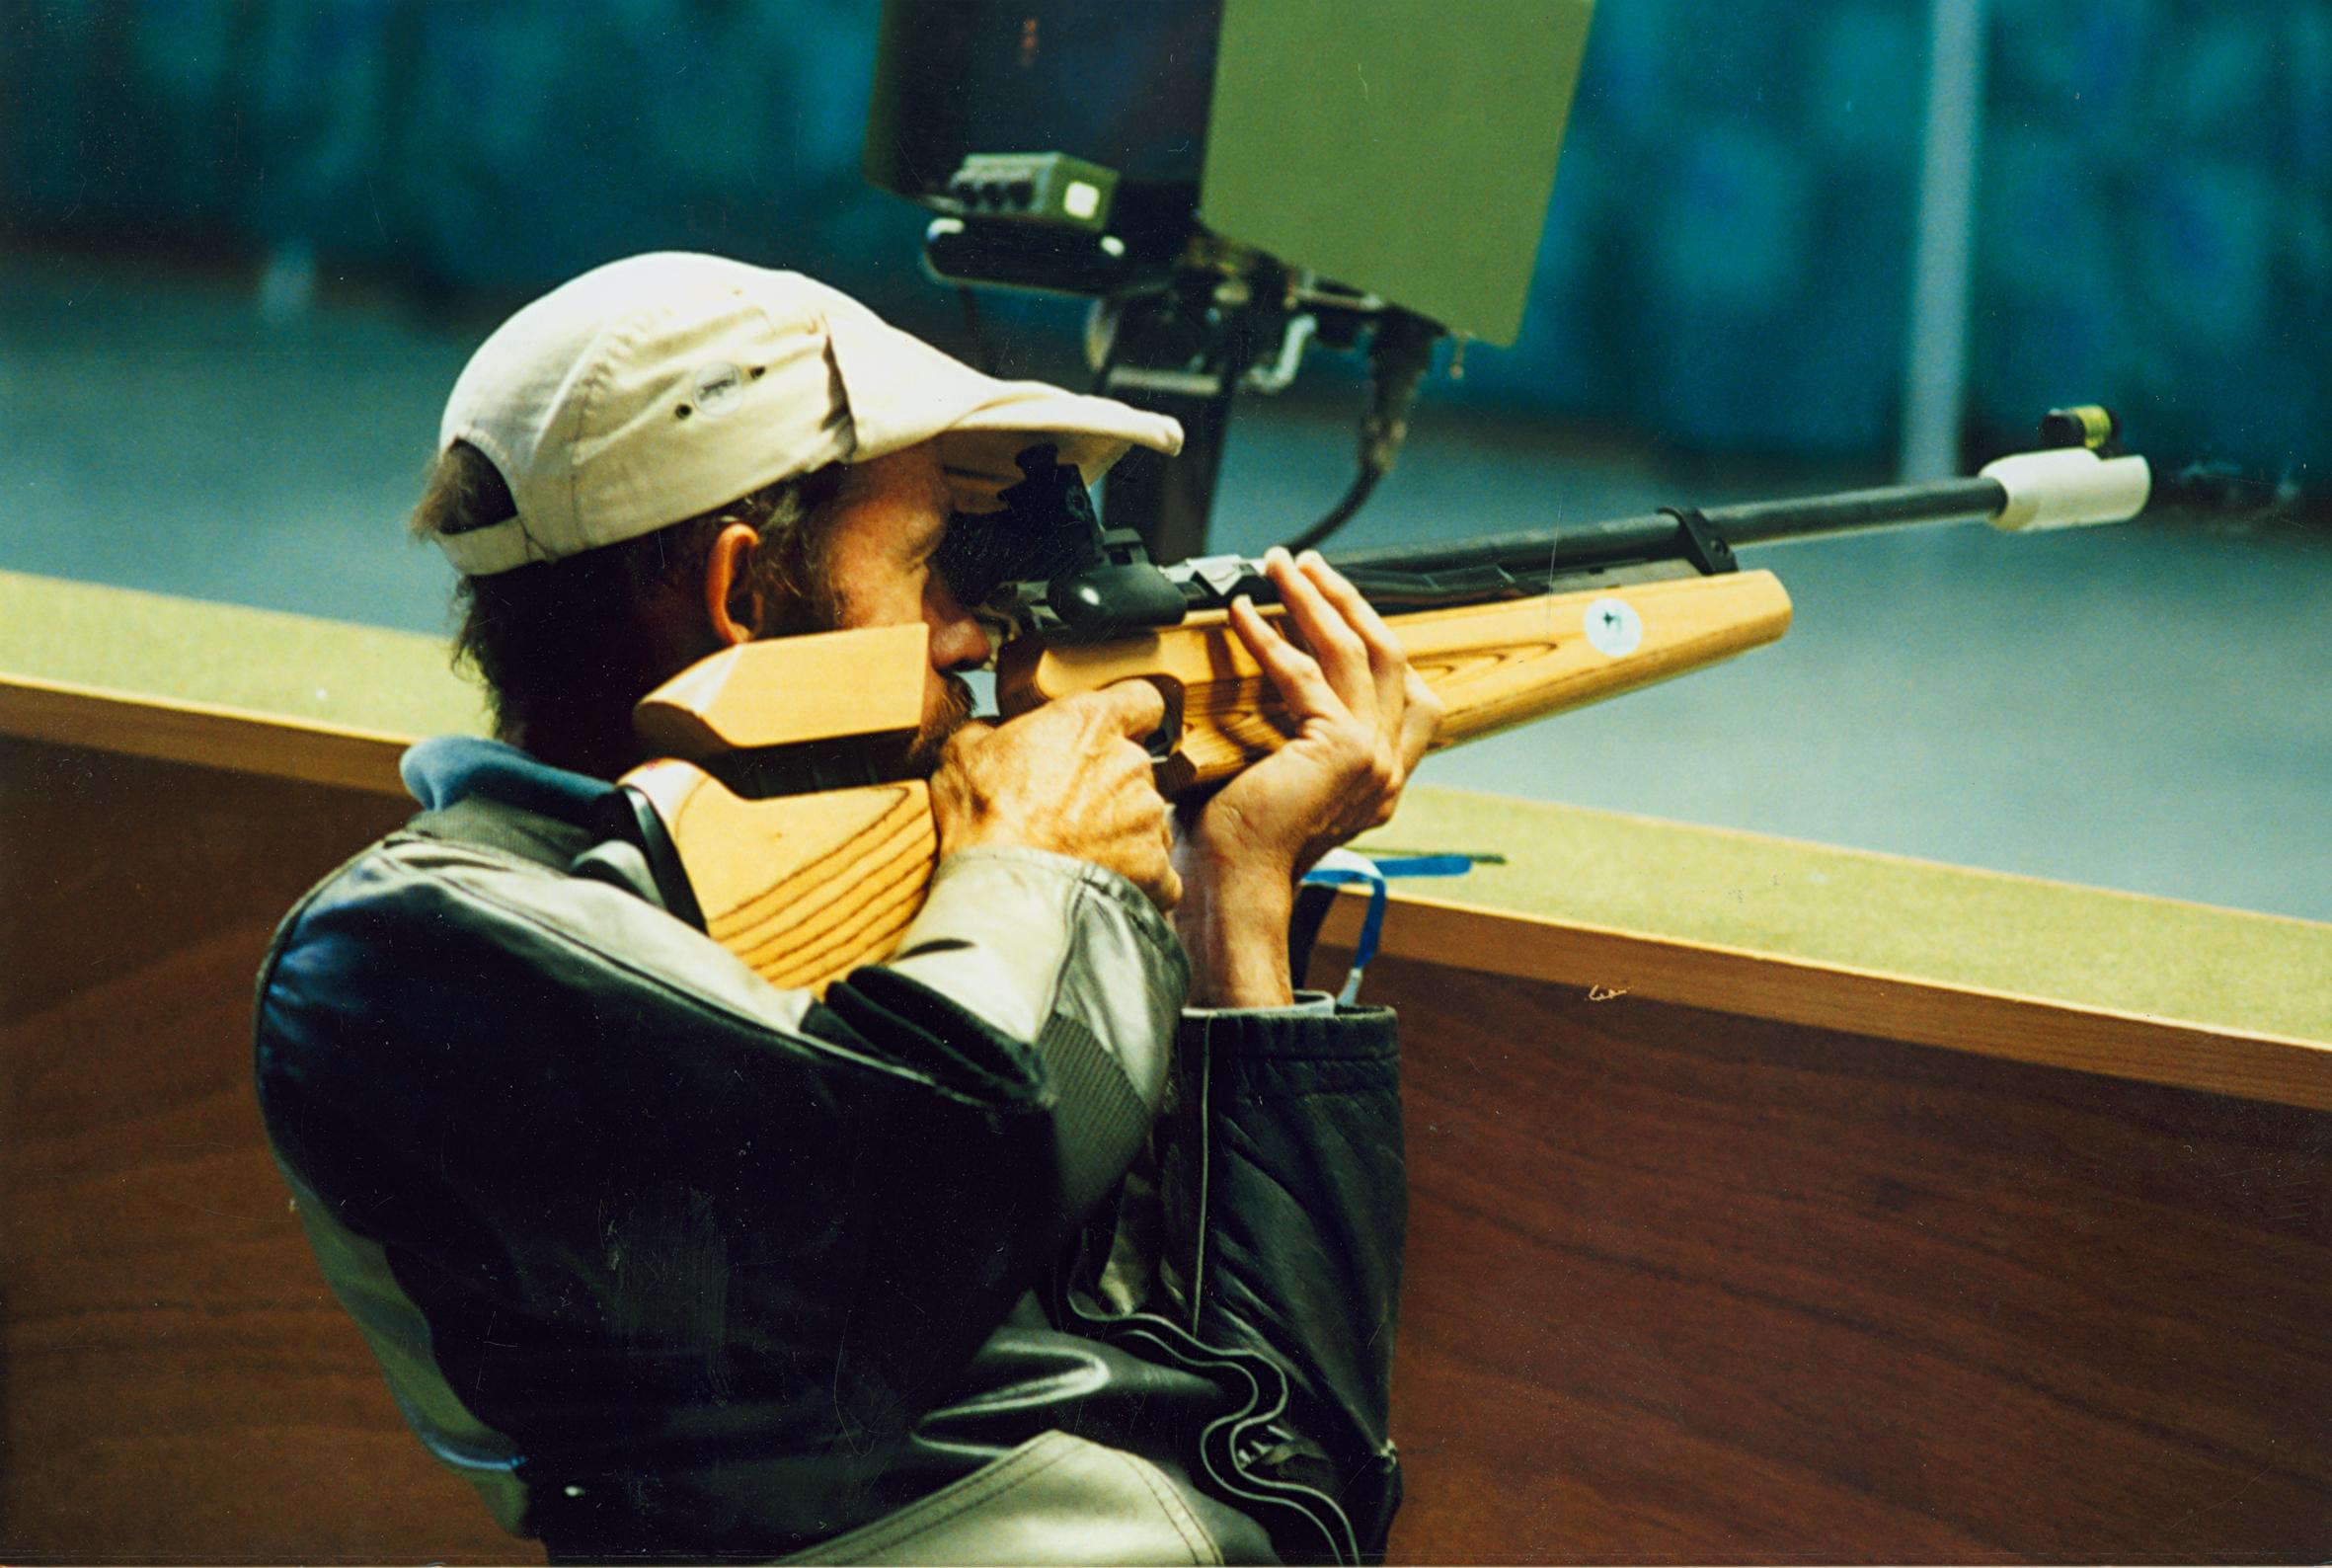 Ashley Adams Wikipedia file:australian paralympic shooter, ashley adams shoots